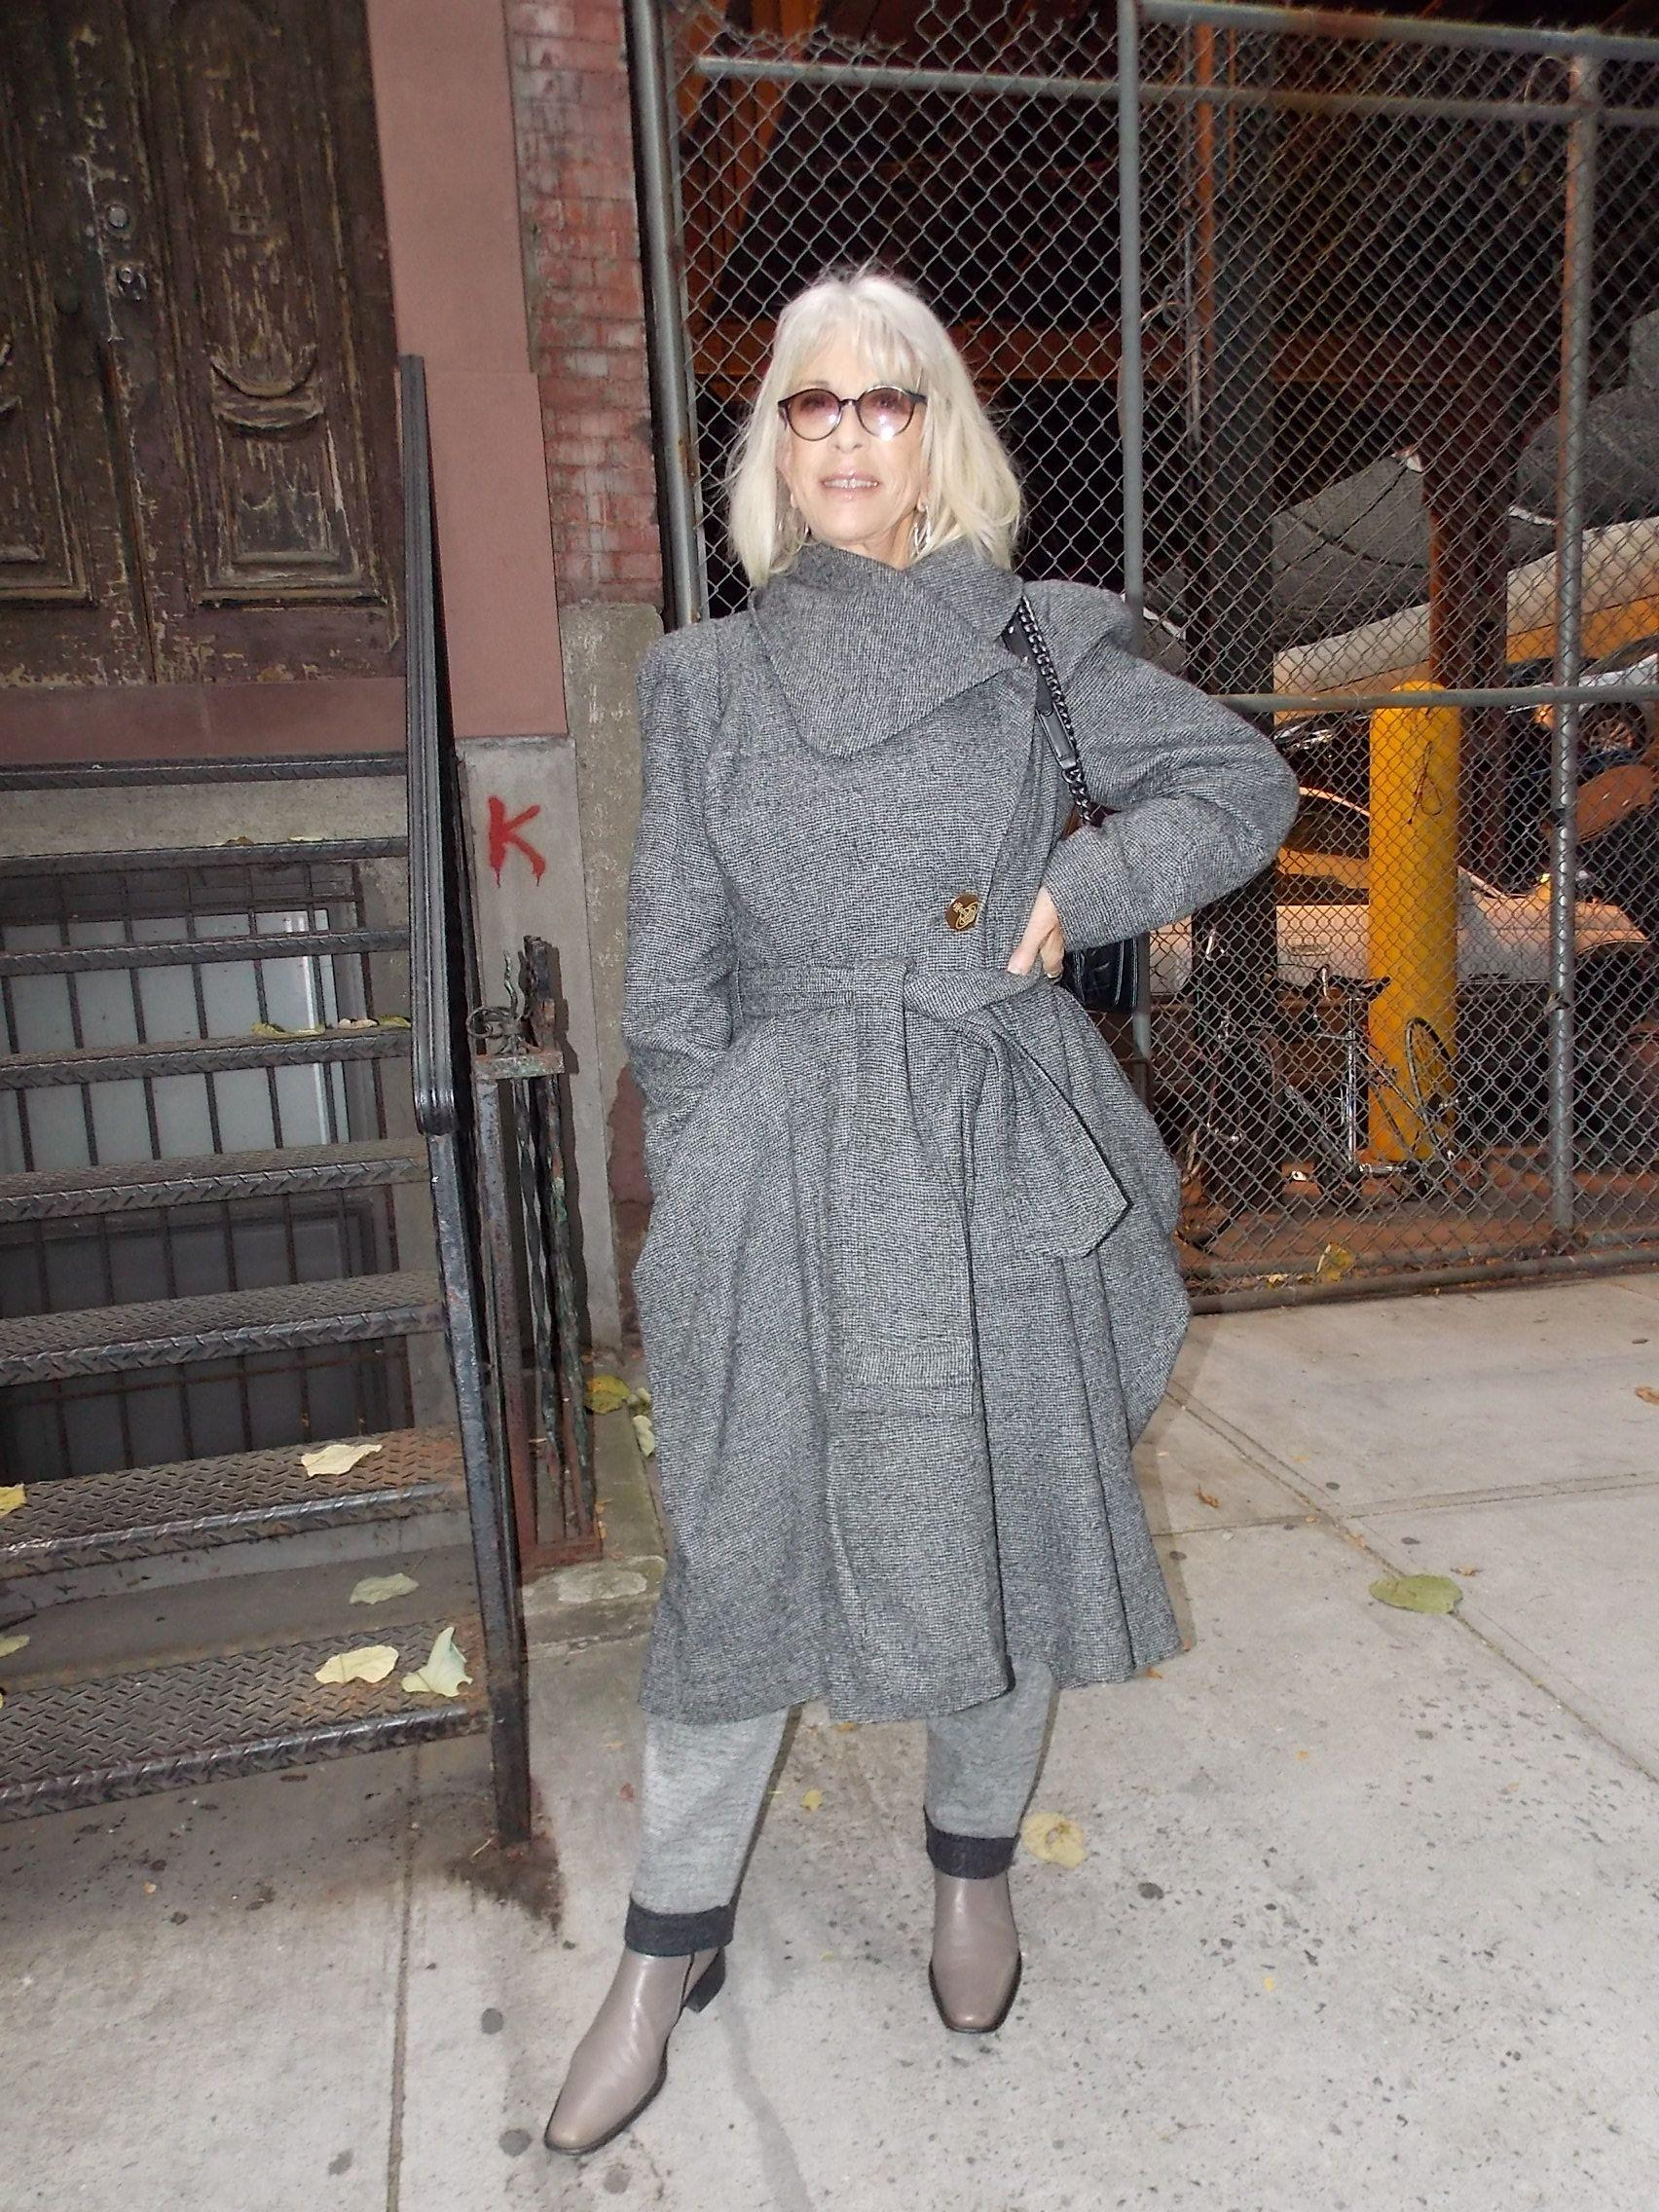 Streetstyle in New York • Vivienne Westwood Coat • Photo: Alina Spiegel